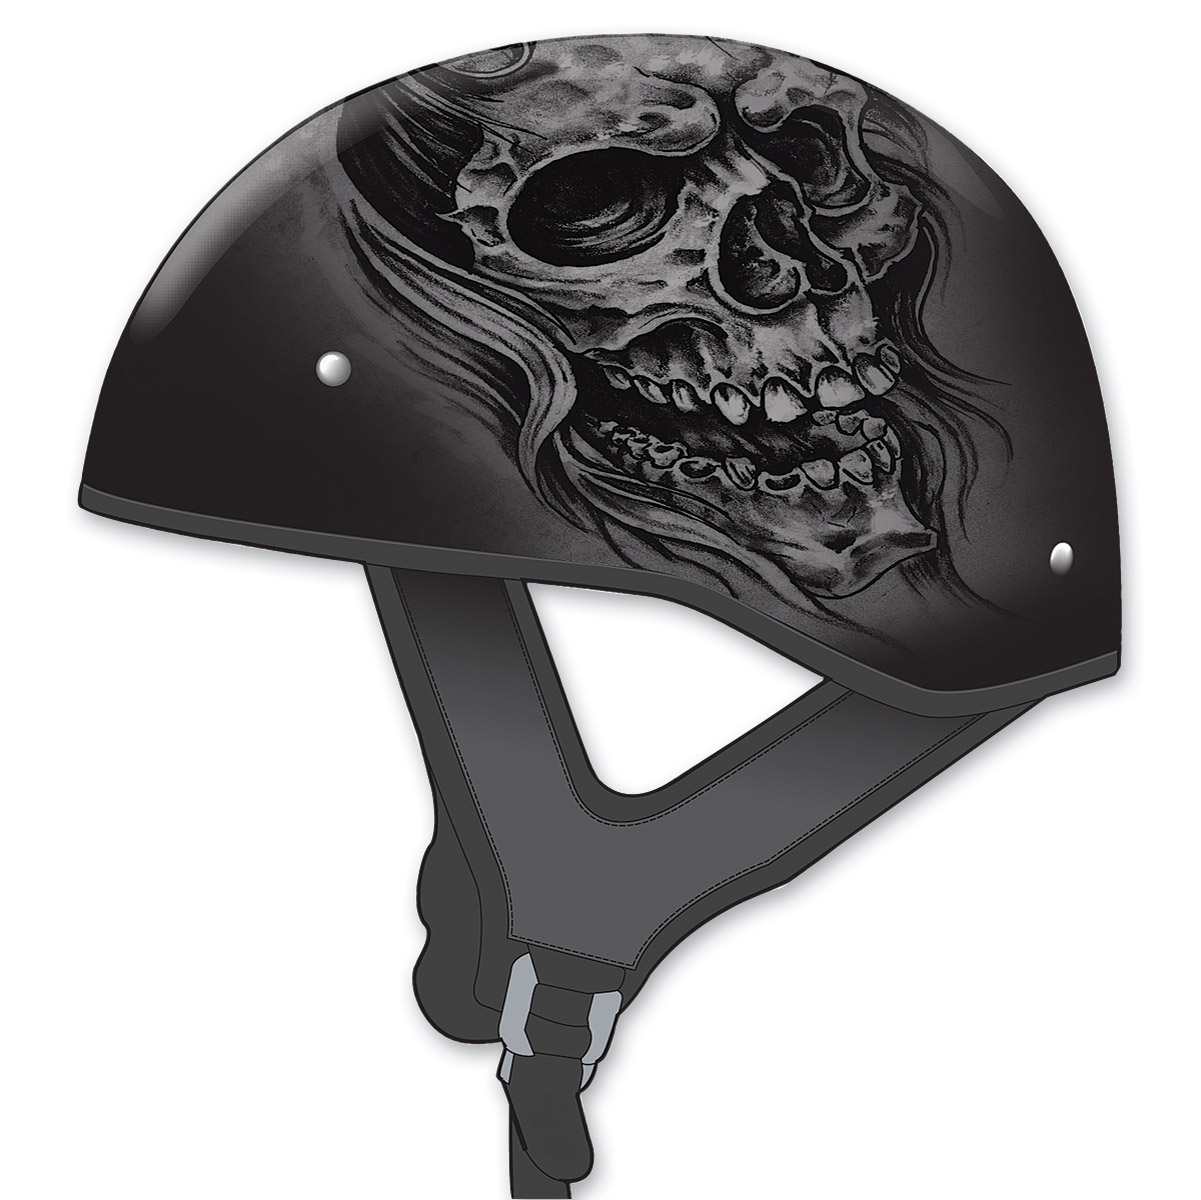 HJC CS-MX 2 Creeper - Helmet House - Helmet House